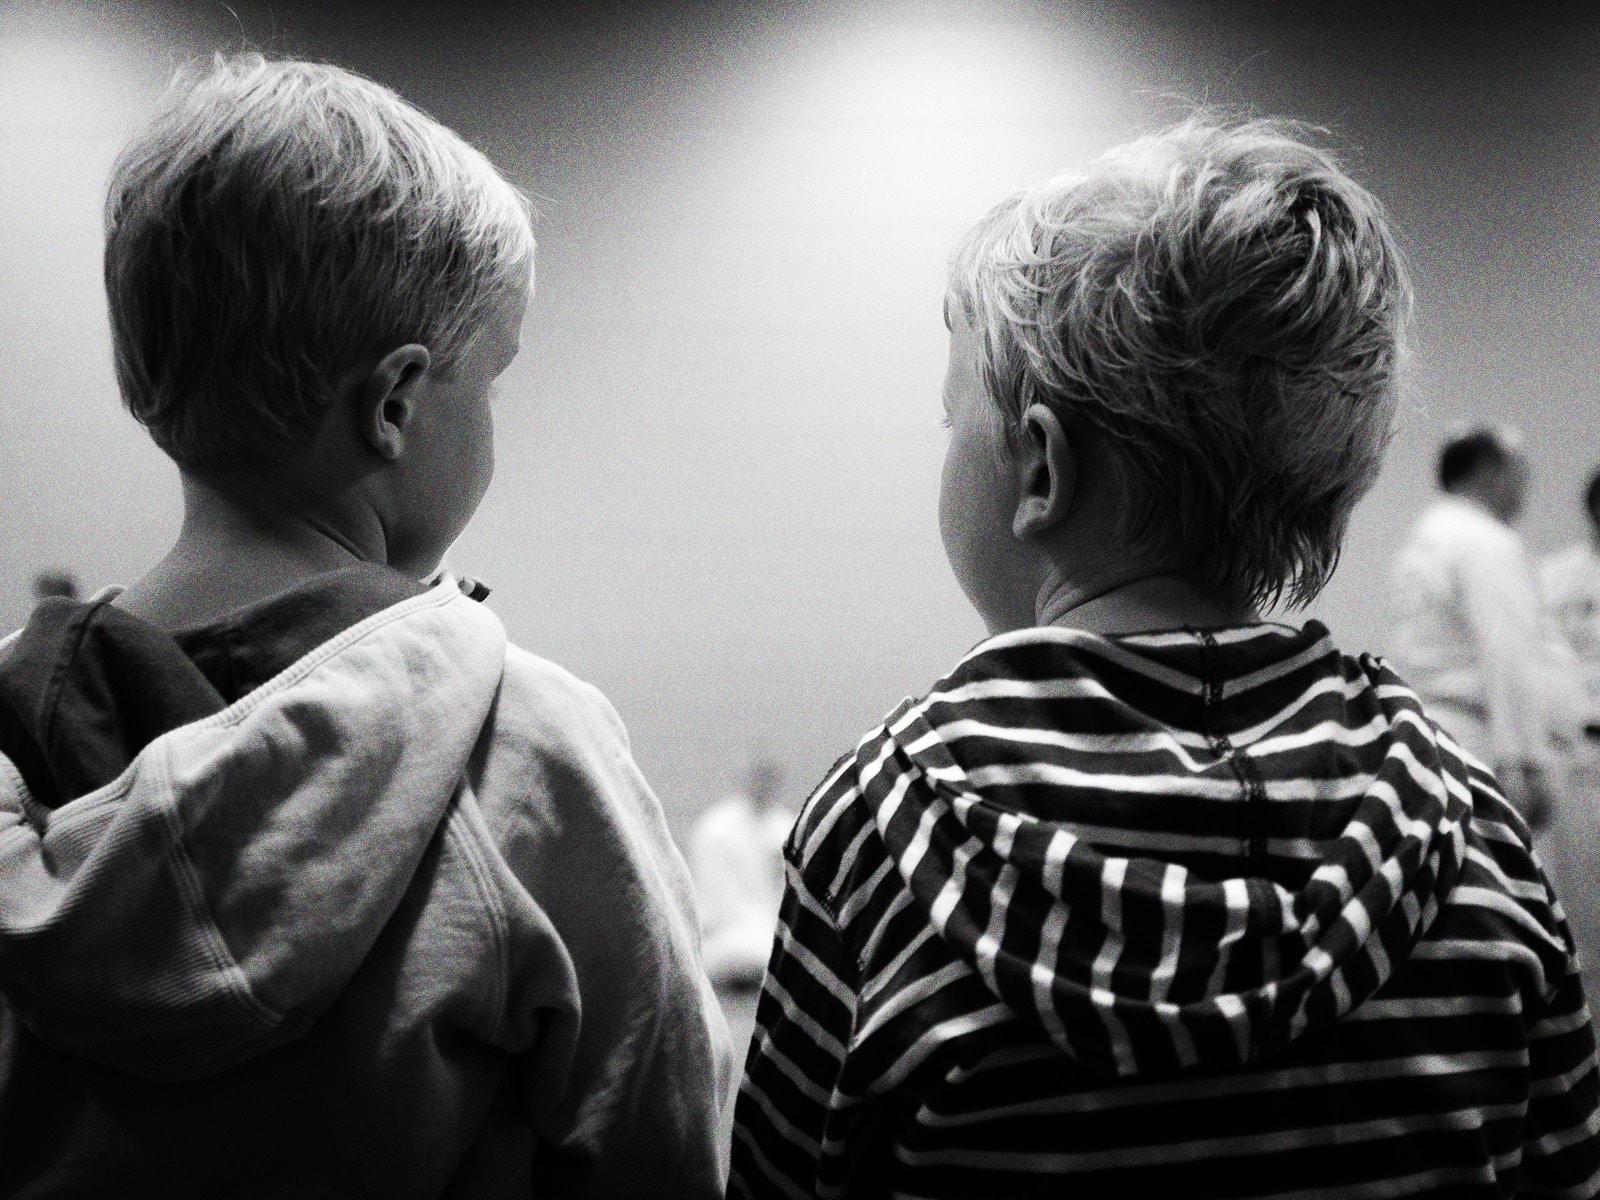 Children of Addiction - Freedom From Addiction